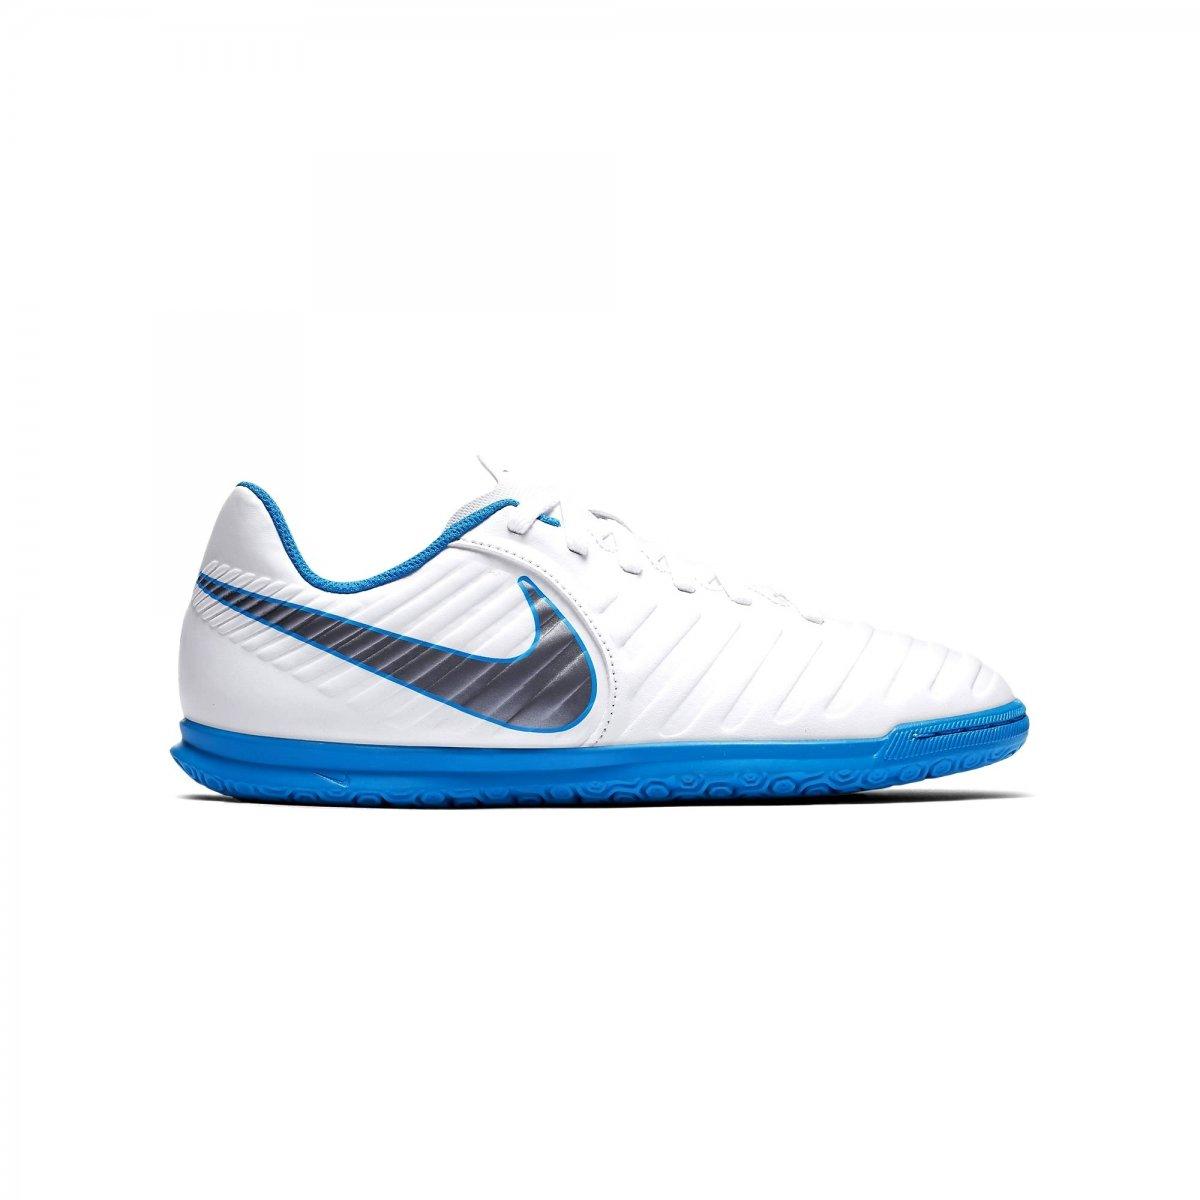 c612abc72c Indoor Infantil Nike Jr Tiempo Legend Club 7 AH7260-107 - Branco ...